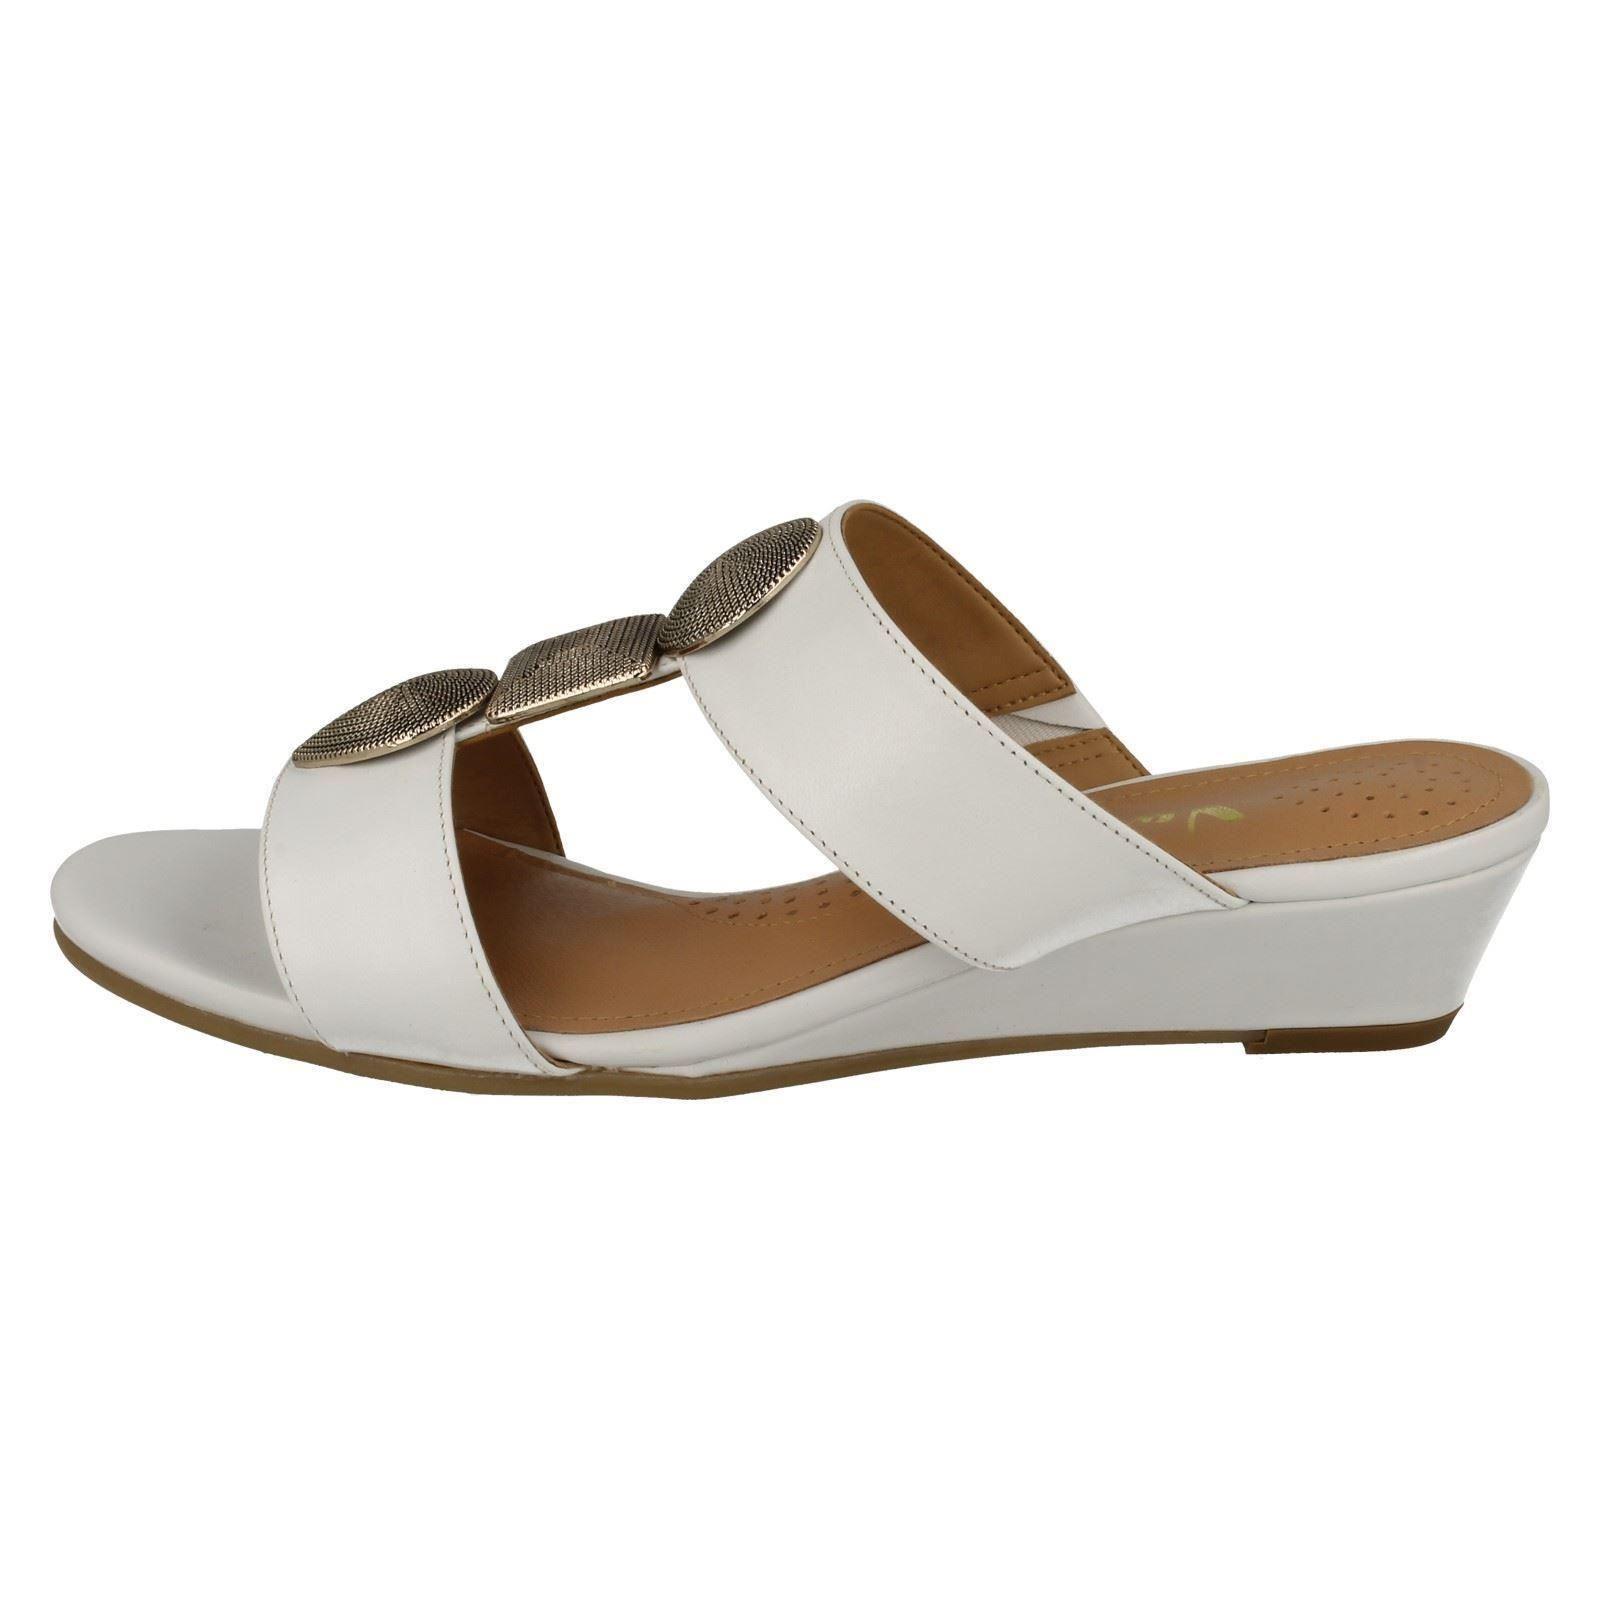 Ladies-Van-Dal-Open-Toe-Slip-On-Summer-Low-Wedge-Leather-Sandals-Epsom thumbnail 3